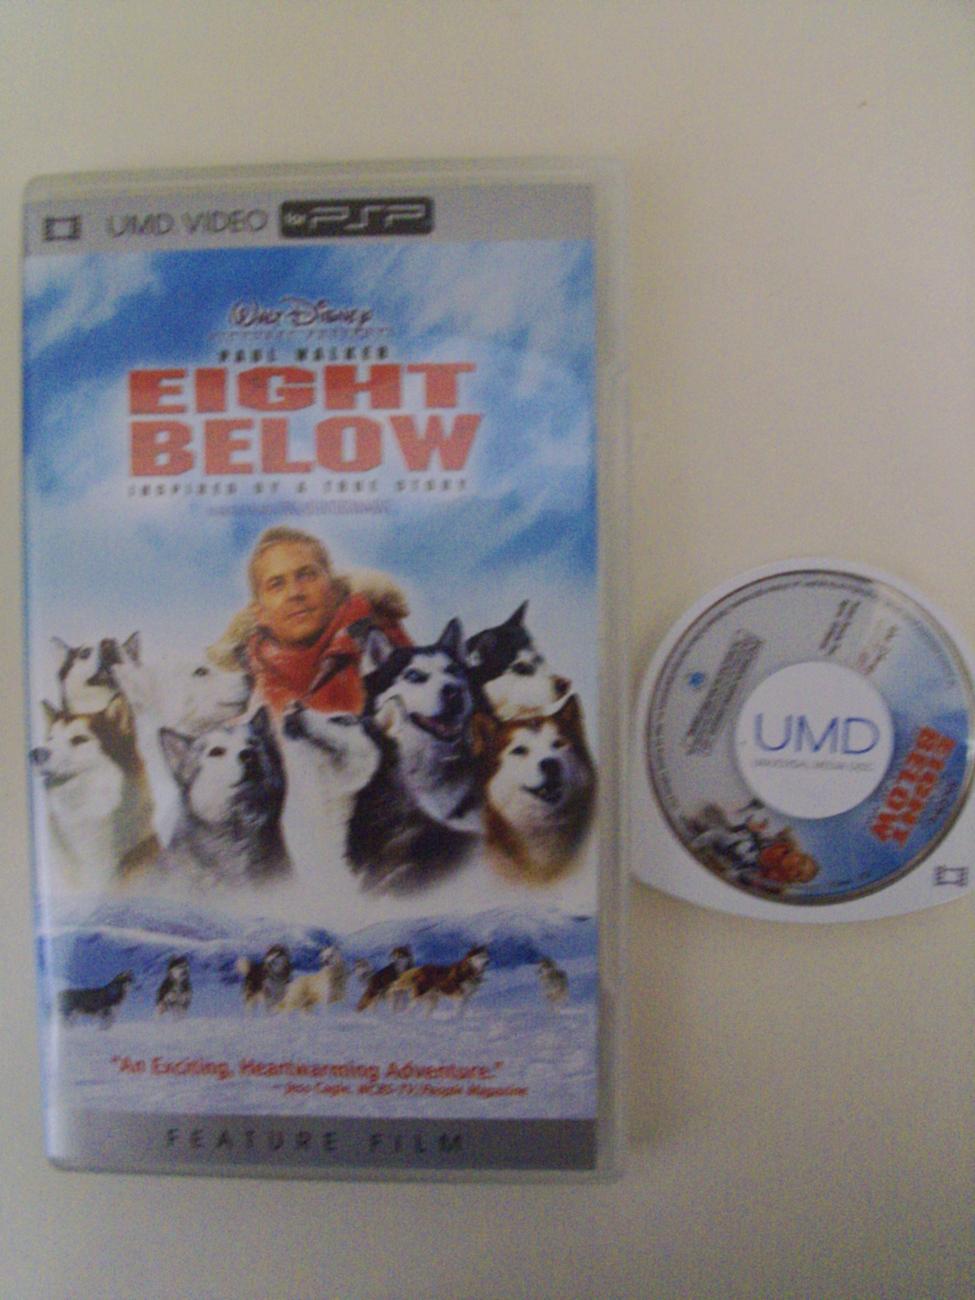 Eight Below UMD video PSP Playstation Portable